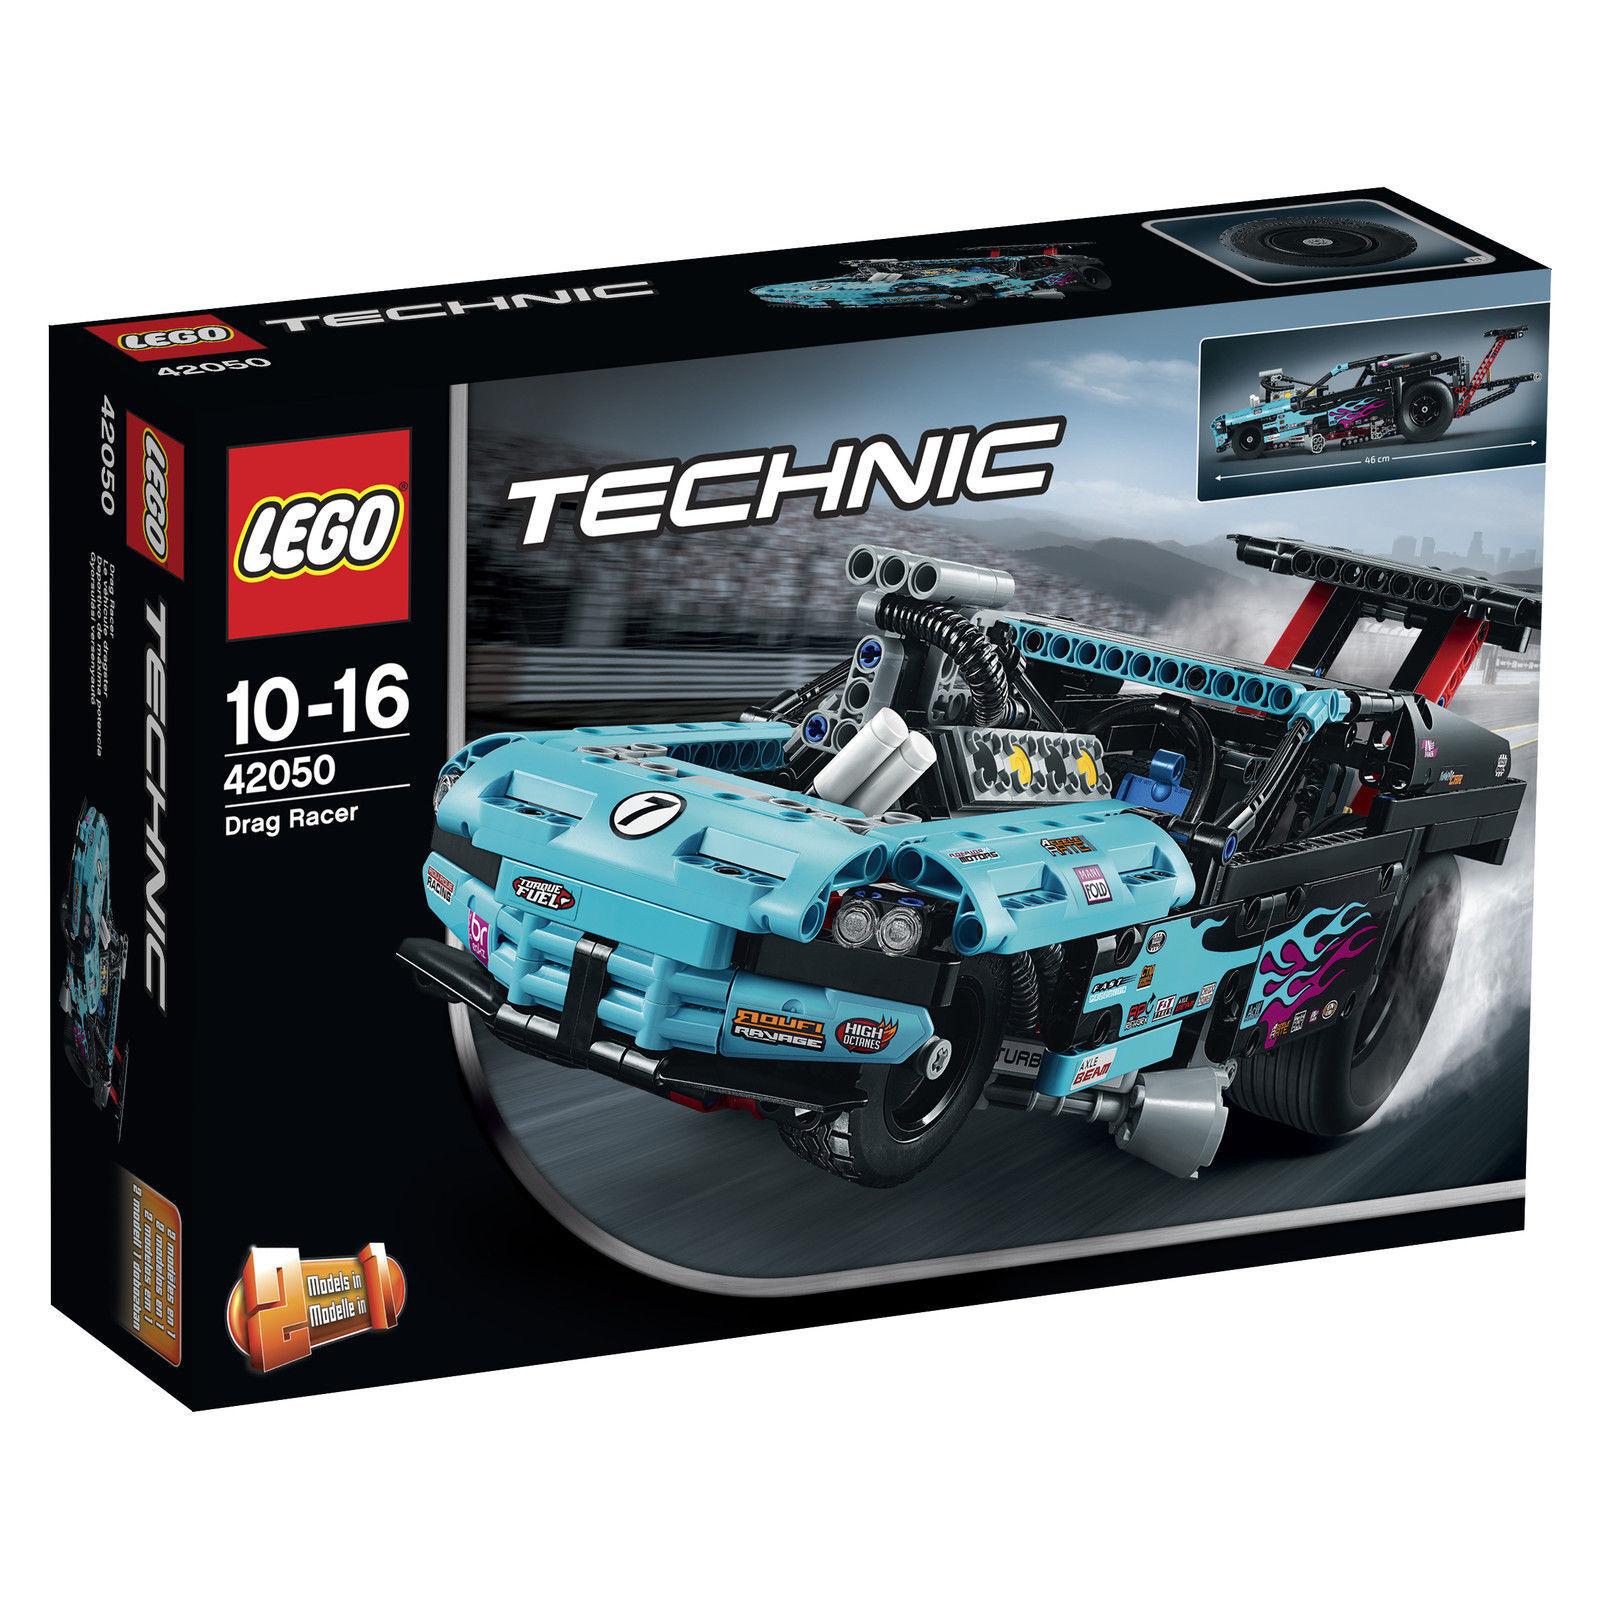 LEGO 42050 Technic Drag Racer - NEU